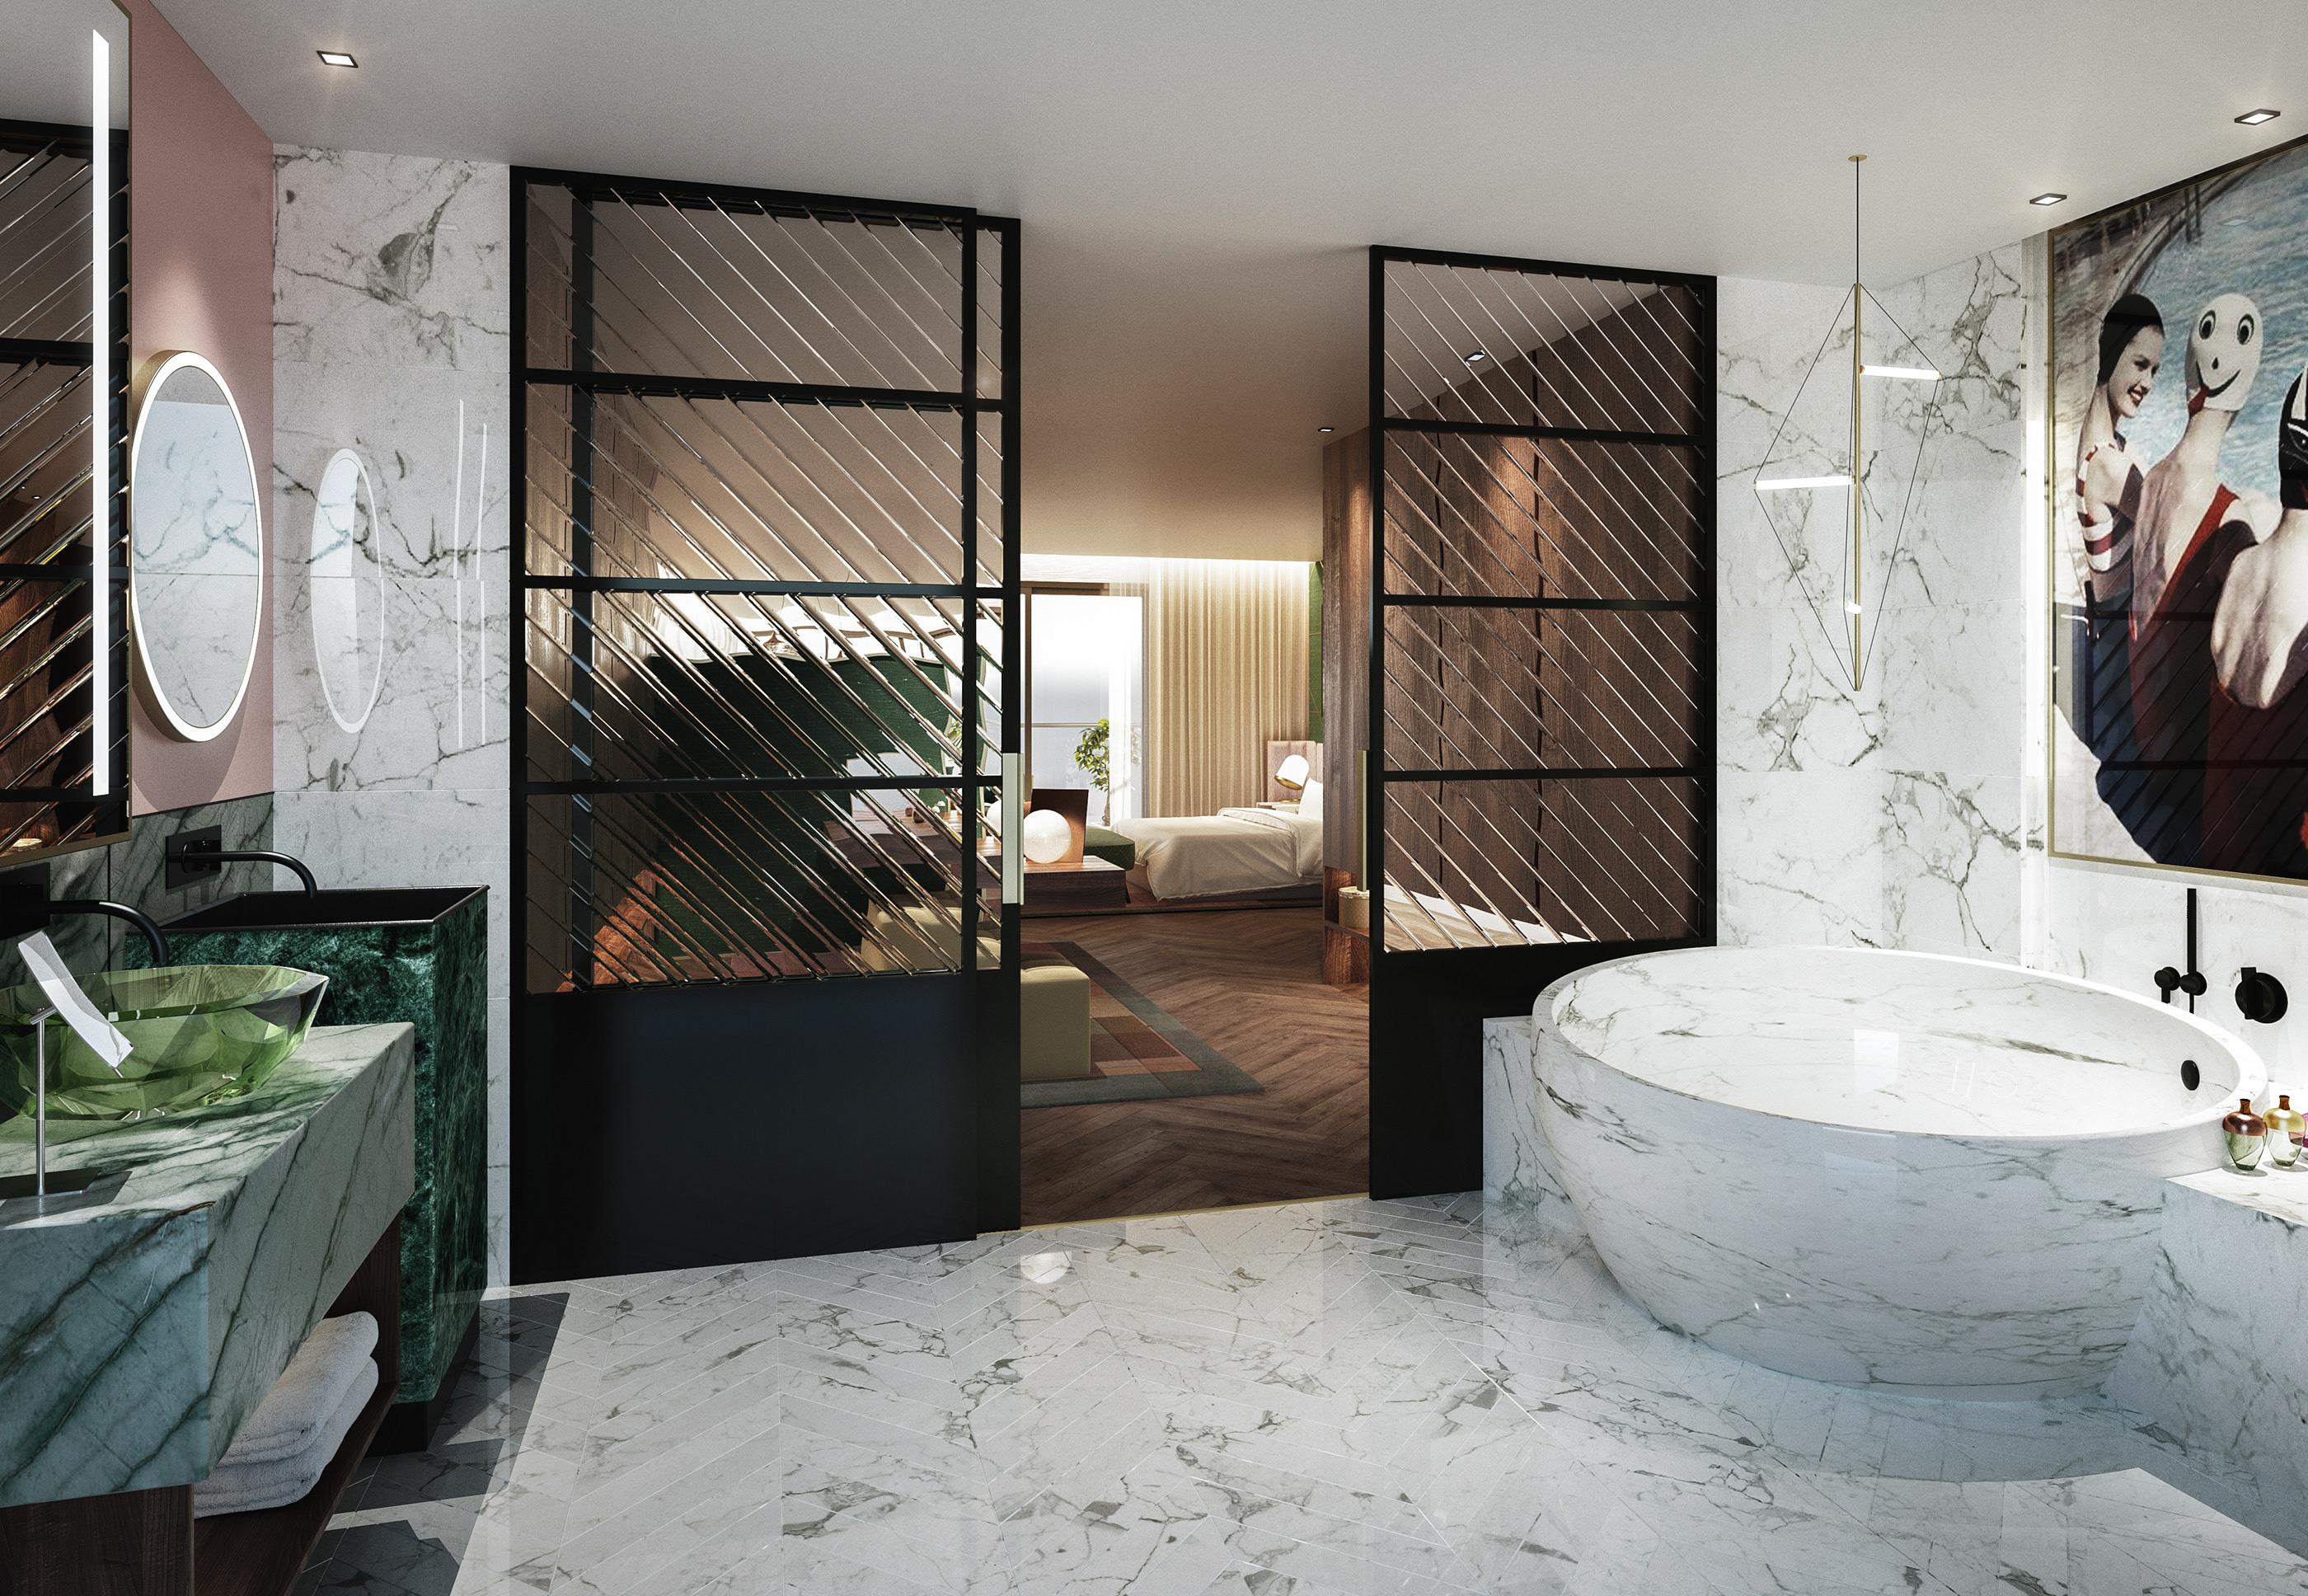 architectural visualization of hotel bathroom